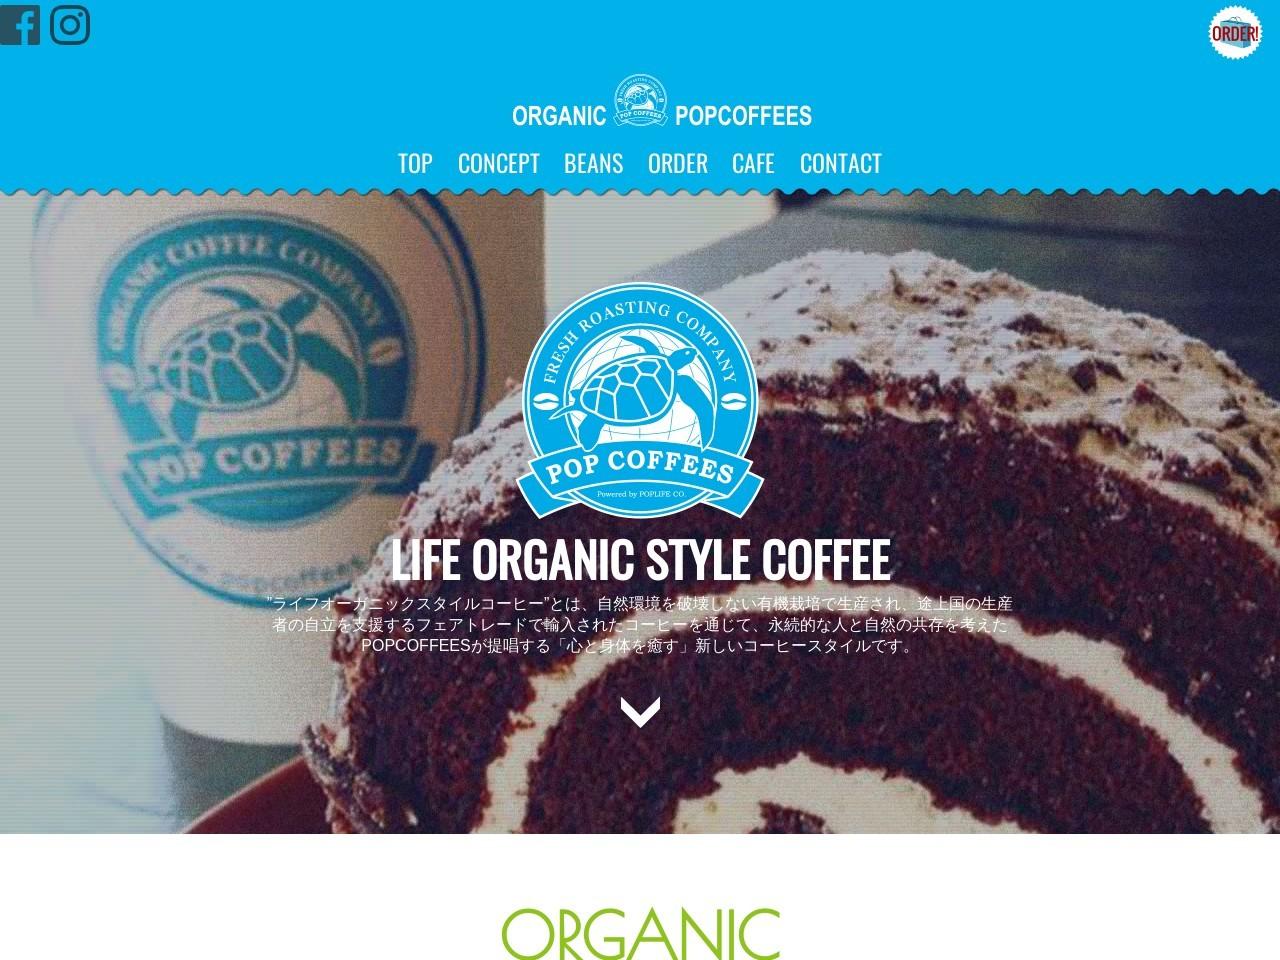 POPCOFFEES(ポップコーヒーズ)は有機無農薬(オーガニック)・フェアトレードコーヒー専門のコーヒー販売店